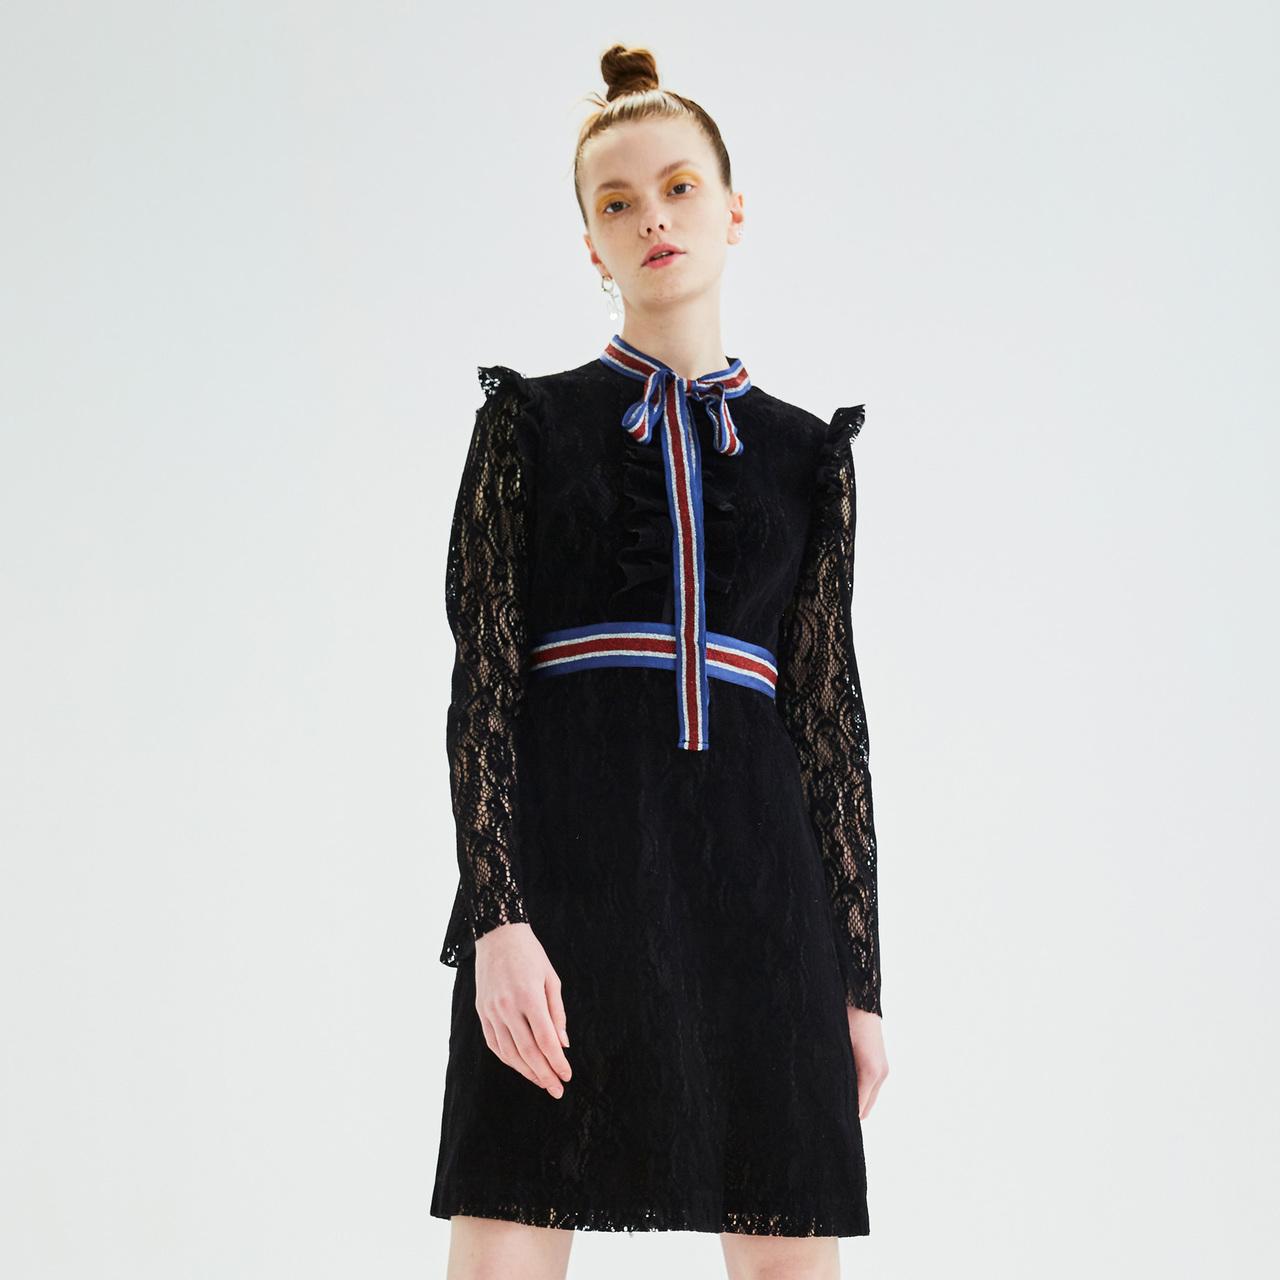 Z11女装2019春装新款拼接系带气质花边镂空蕾丝连衣裙Z18CH417